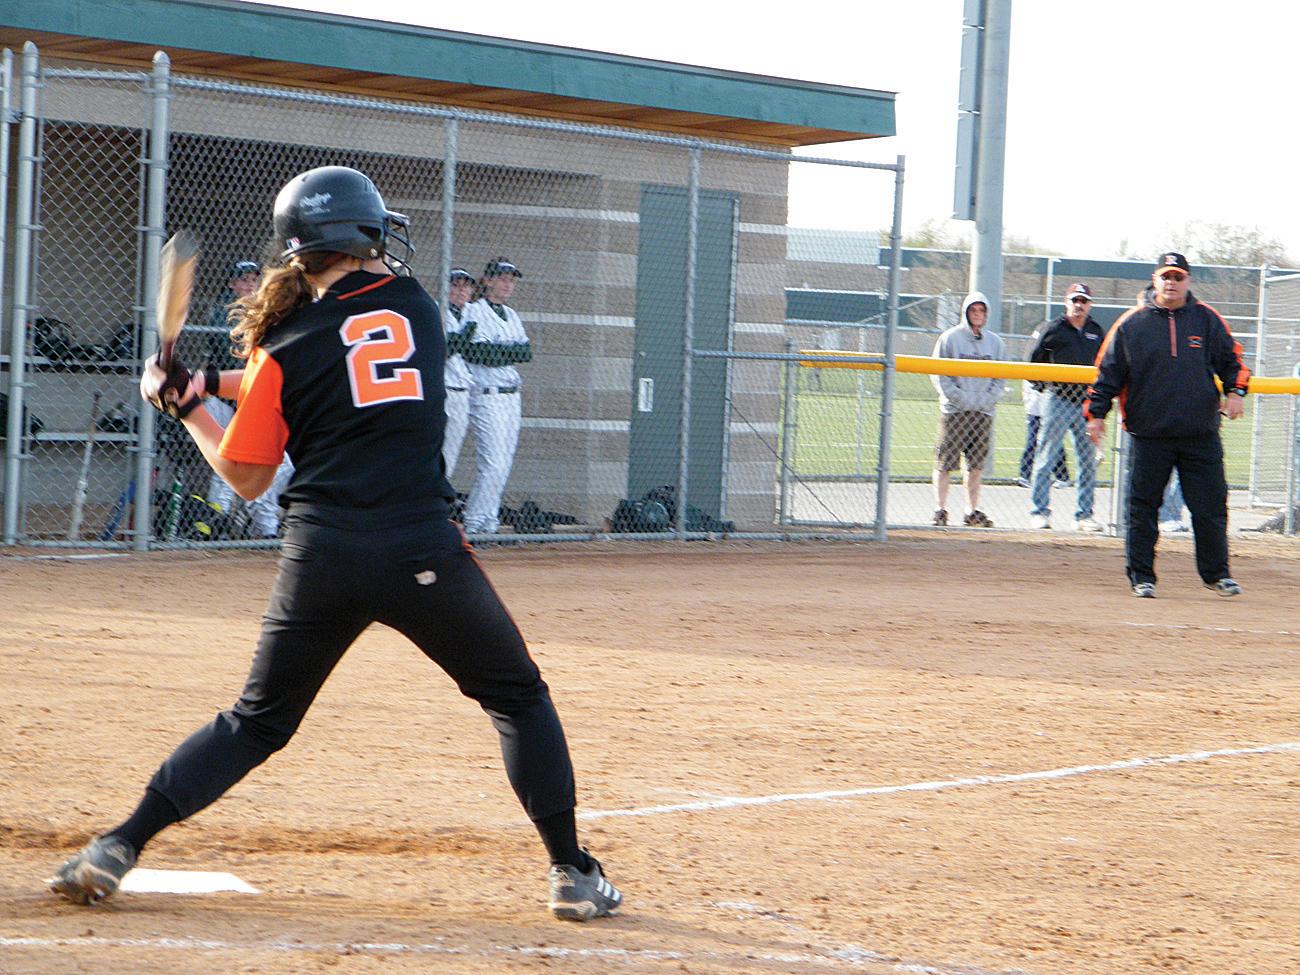 Lauren Pasciak blasts the winning hit.